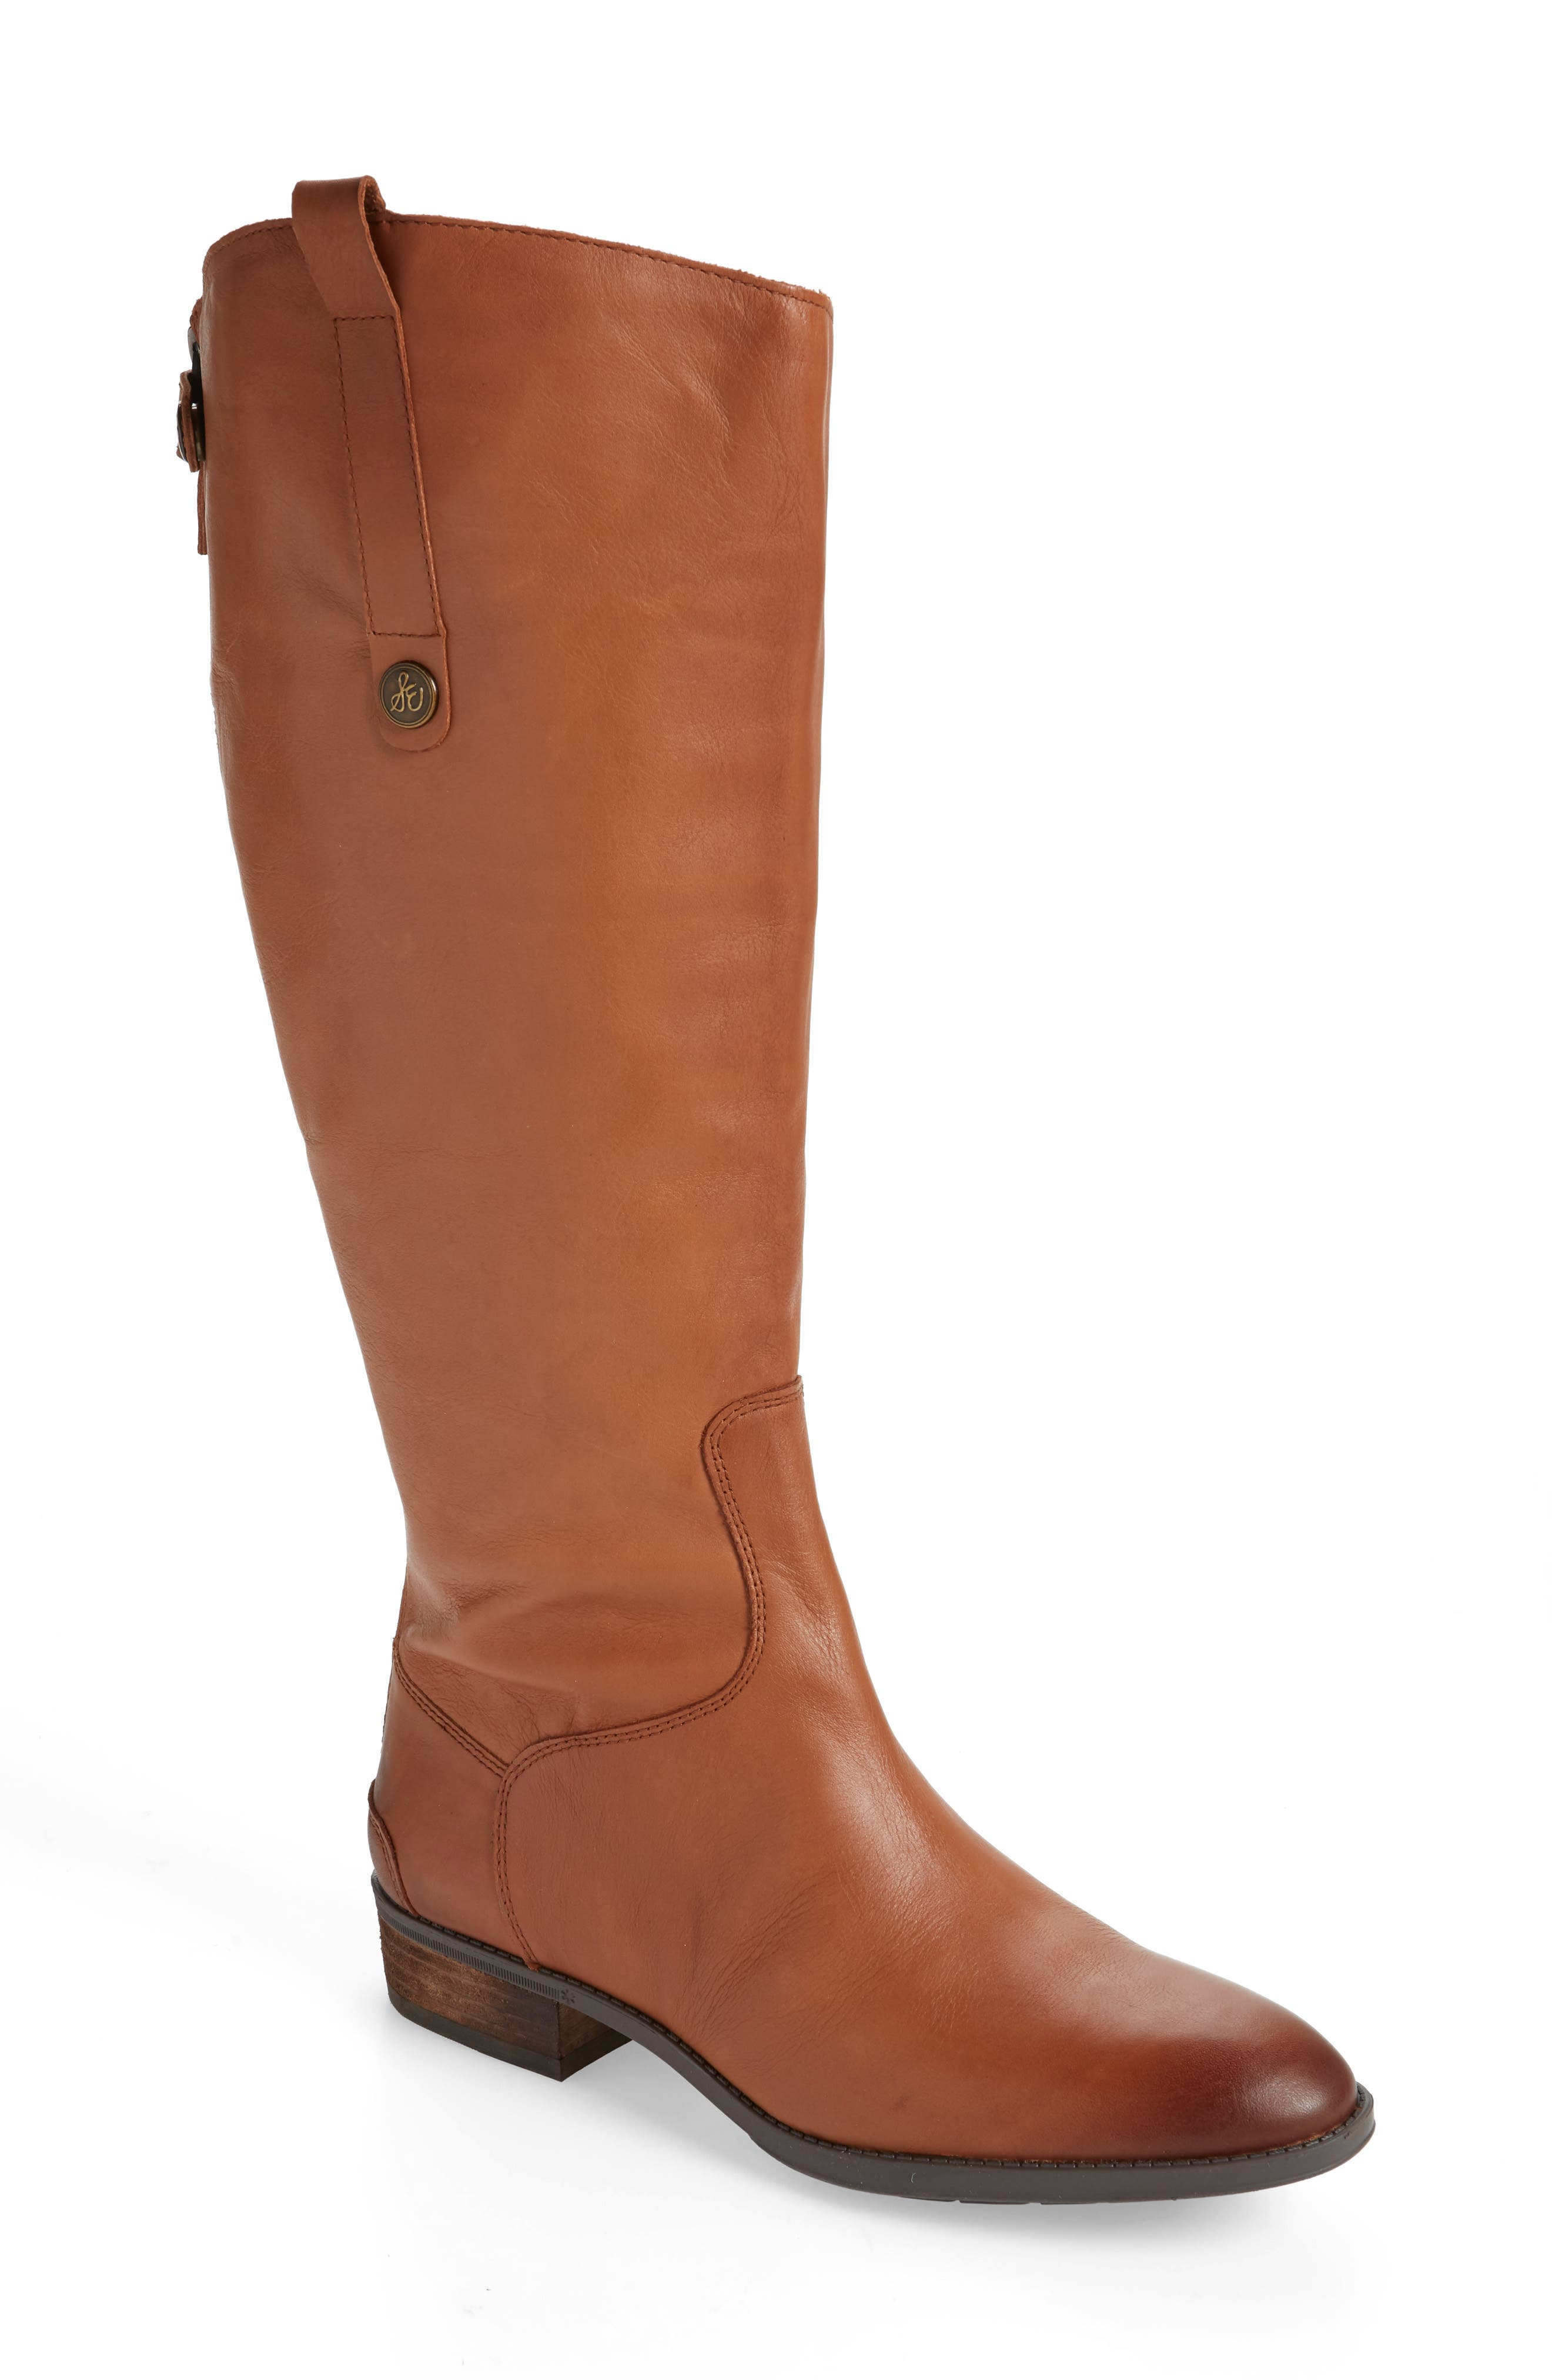 Sam Edelman Penny Boot, Wide Calf W - Brown